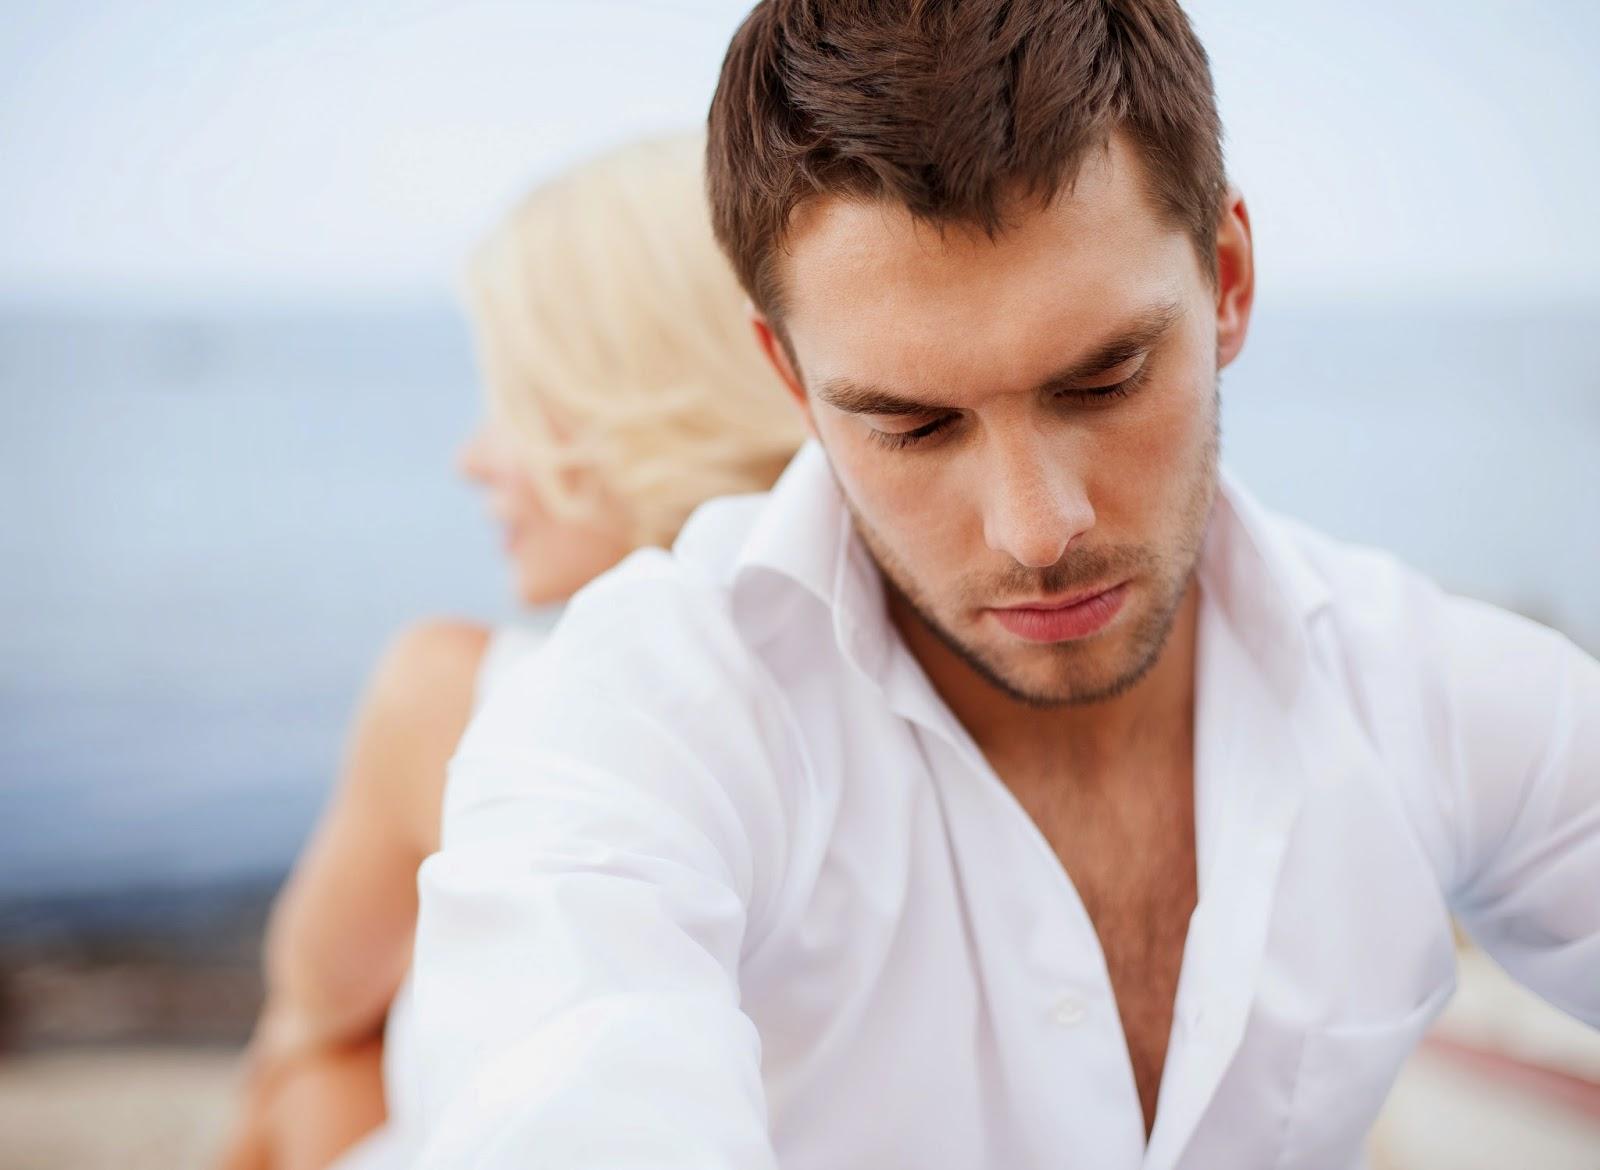 Dating nsa free apps, Online international advice dating, Dating beijing website